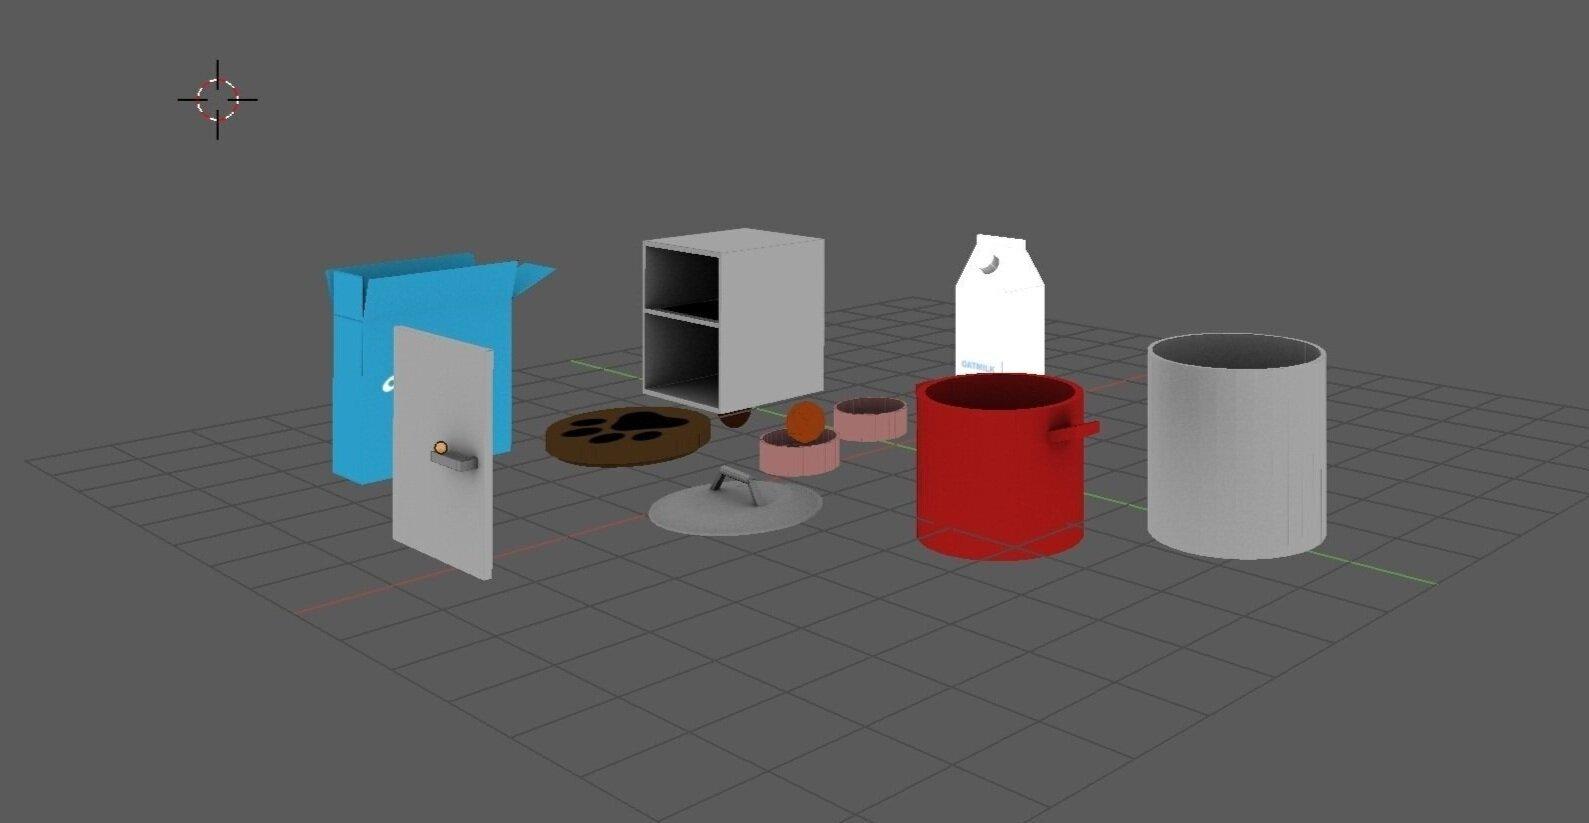 3D Model Rendering with Blender